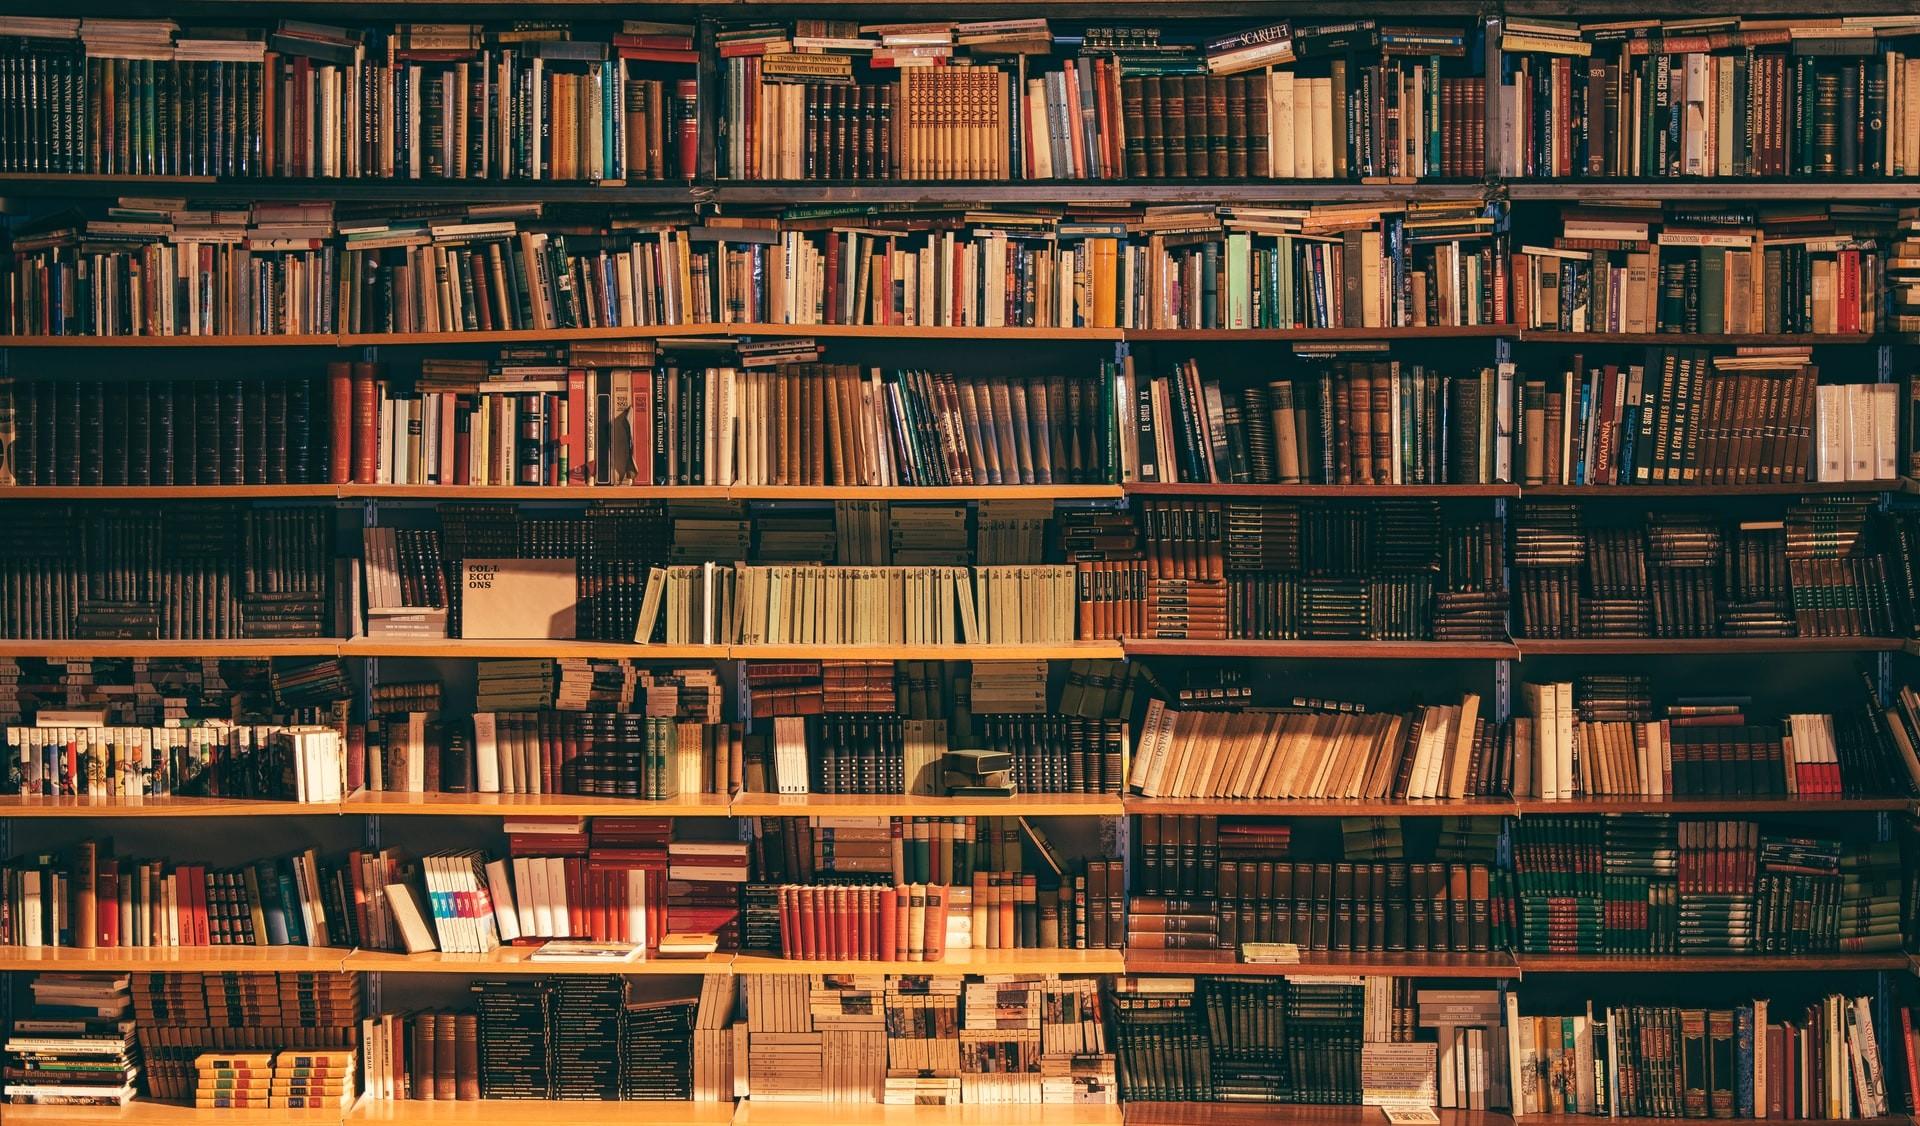 13 livros para devorar no mês de setembro (Foto: Alfons Morales/Unsplash)